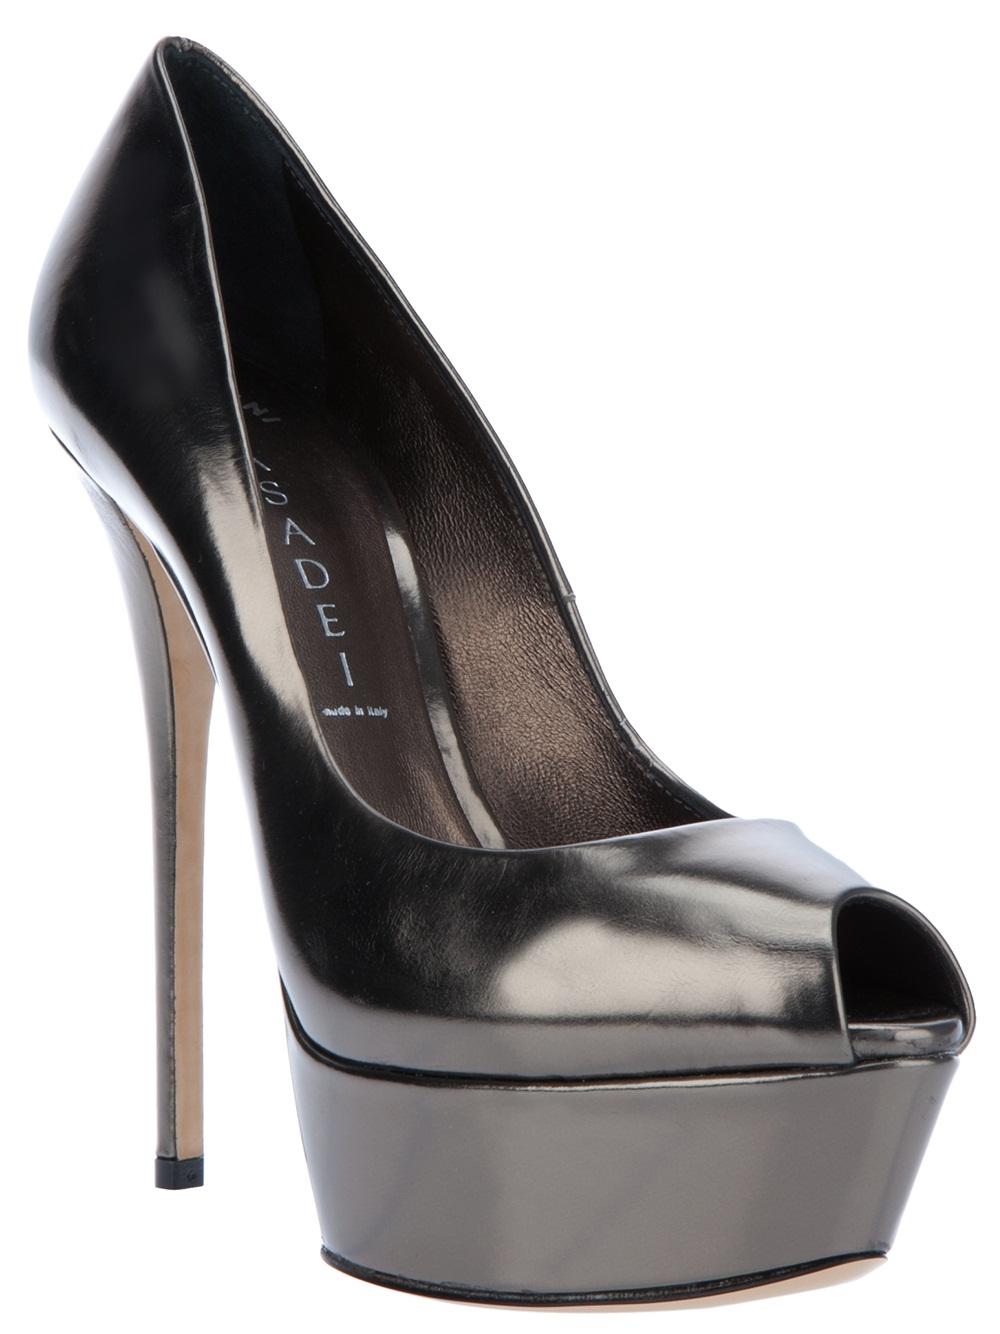 open-toe pumps - Black Casadei 2uLOk